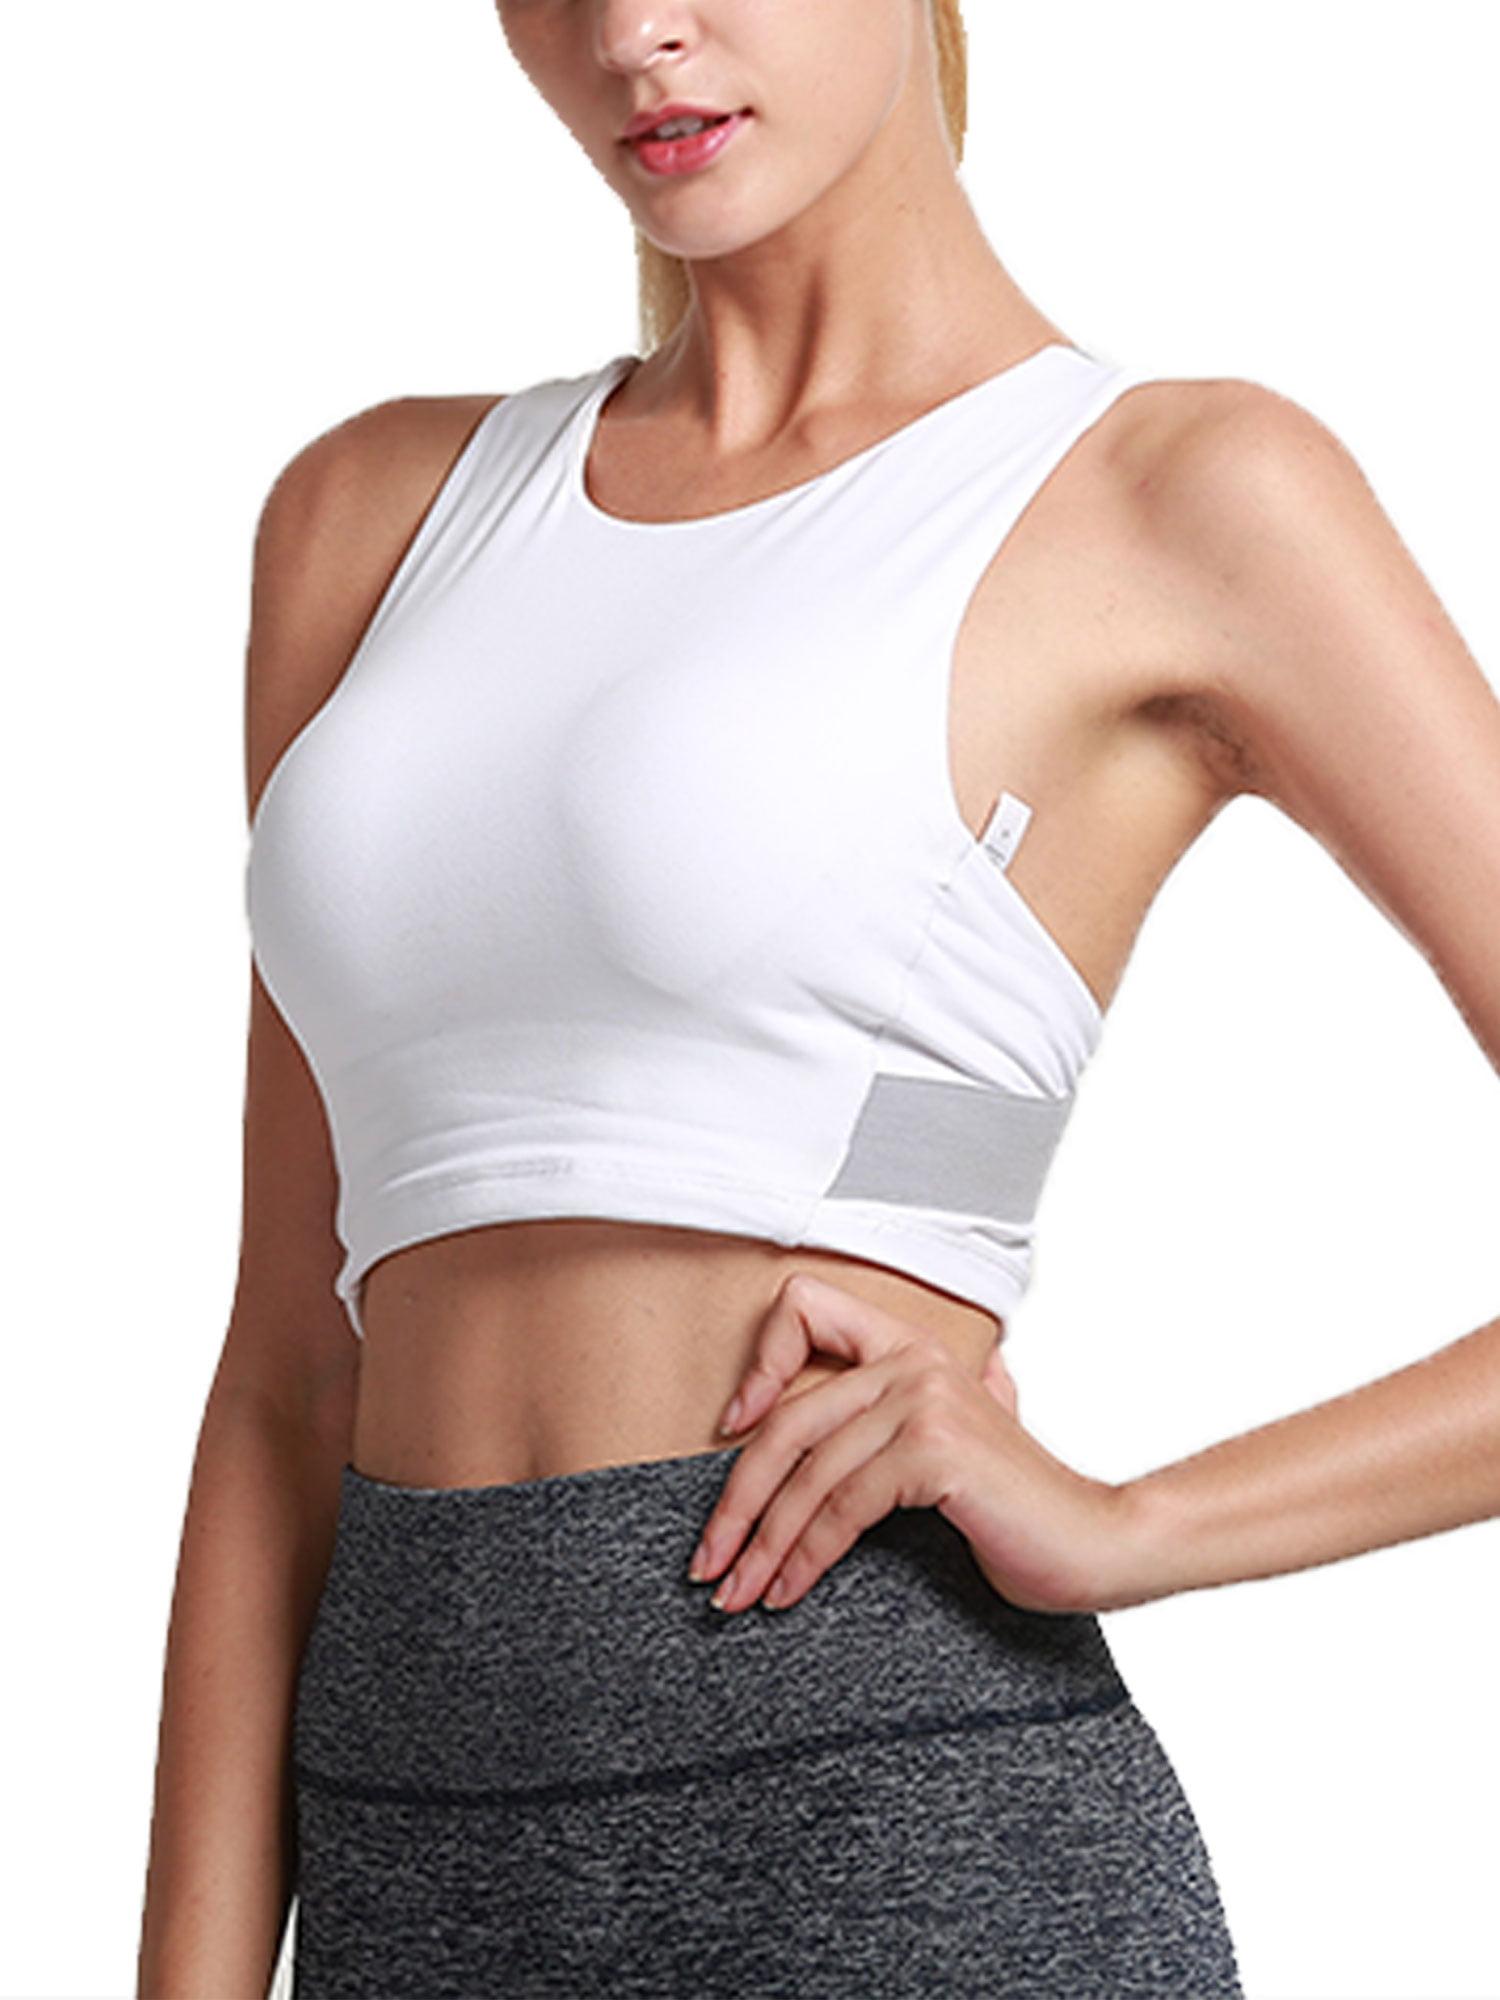 Women Yoga Fitness Stretch Workout Seamless Racerback Padded Sports Bra Tank Top